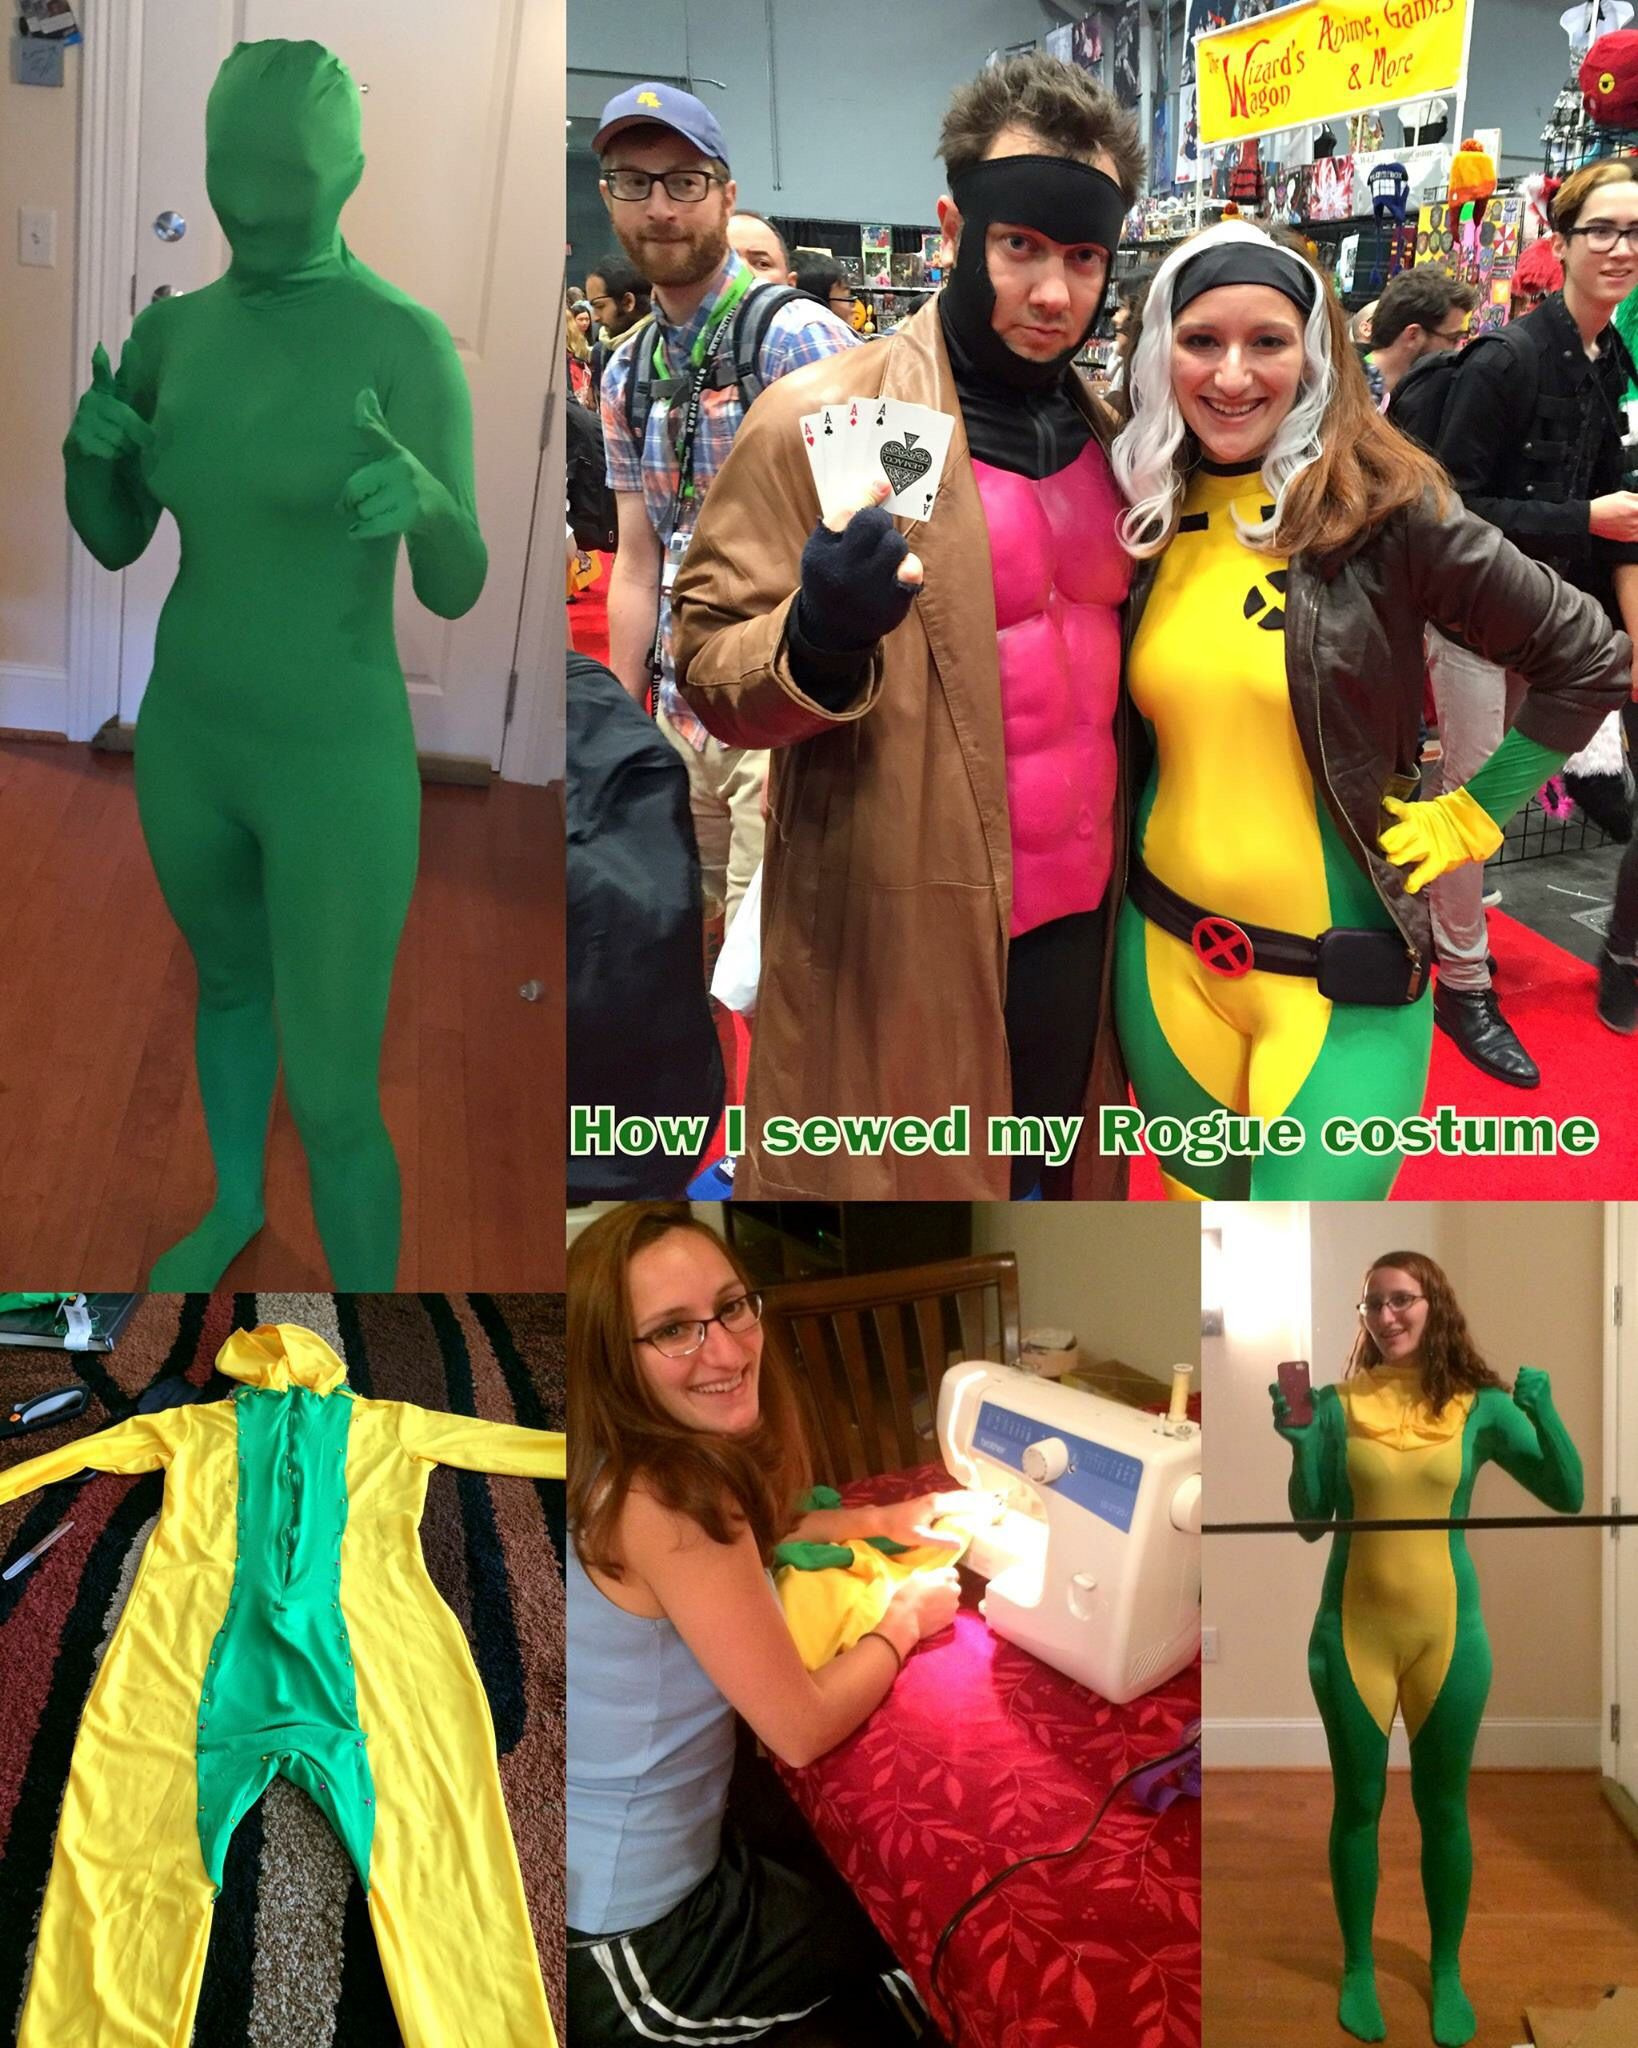 Diy x men rogue costume costume pinterest rogue costume diy x men rogue costume solutioingenieria Gallery